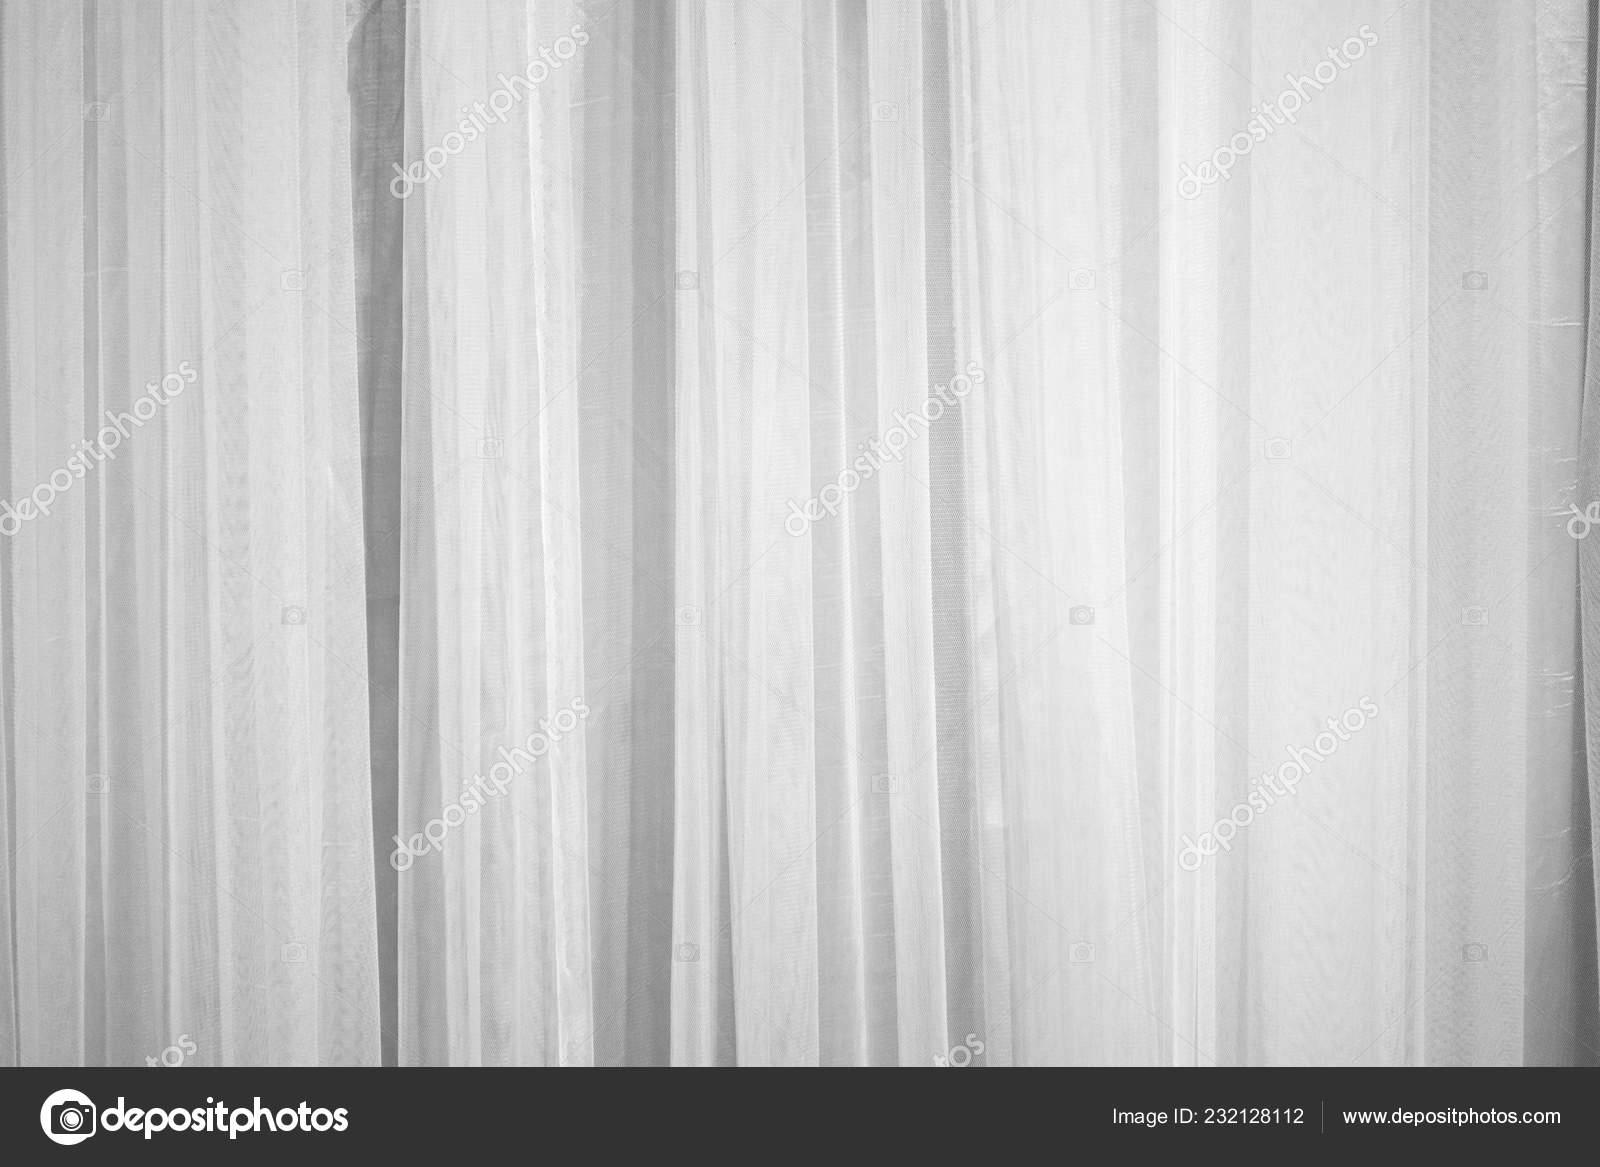 https depositphotos com 232128112 stock photo white curtain fabric pattern surface html